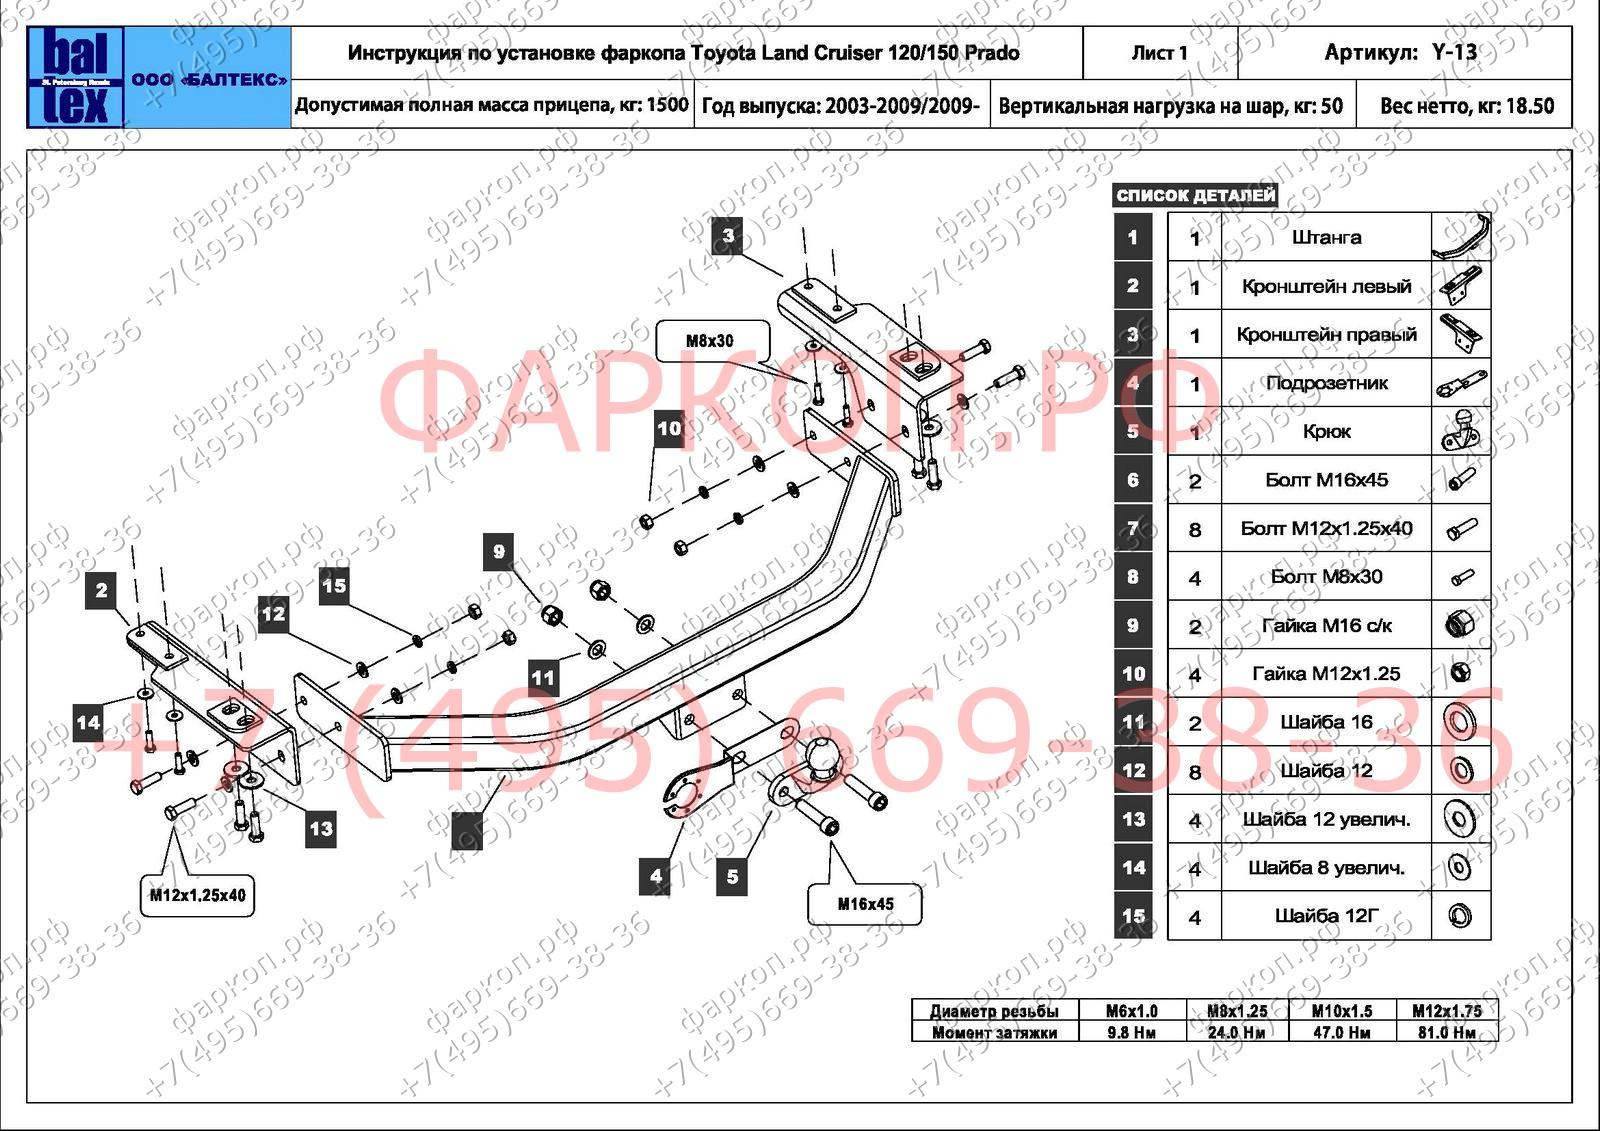 Фаркопы для Toyota Land Cruiser - alta-karter.ru